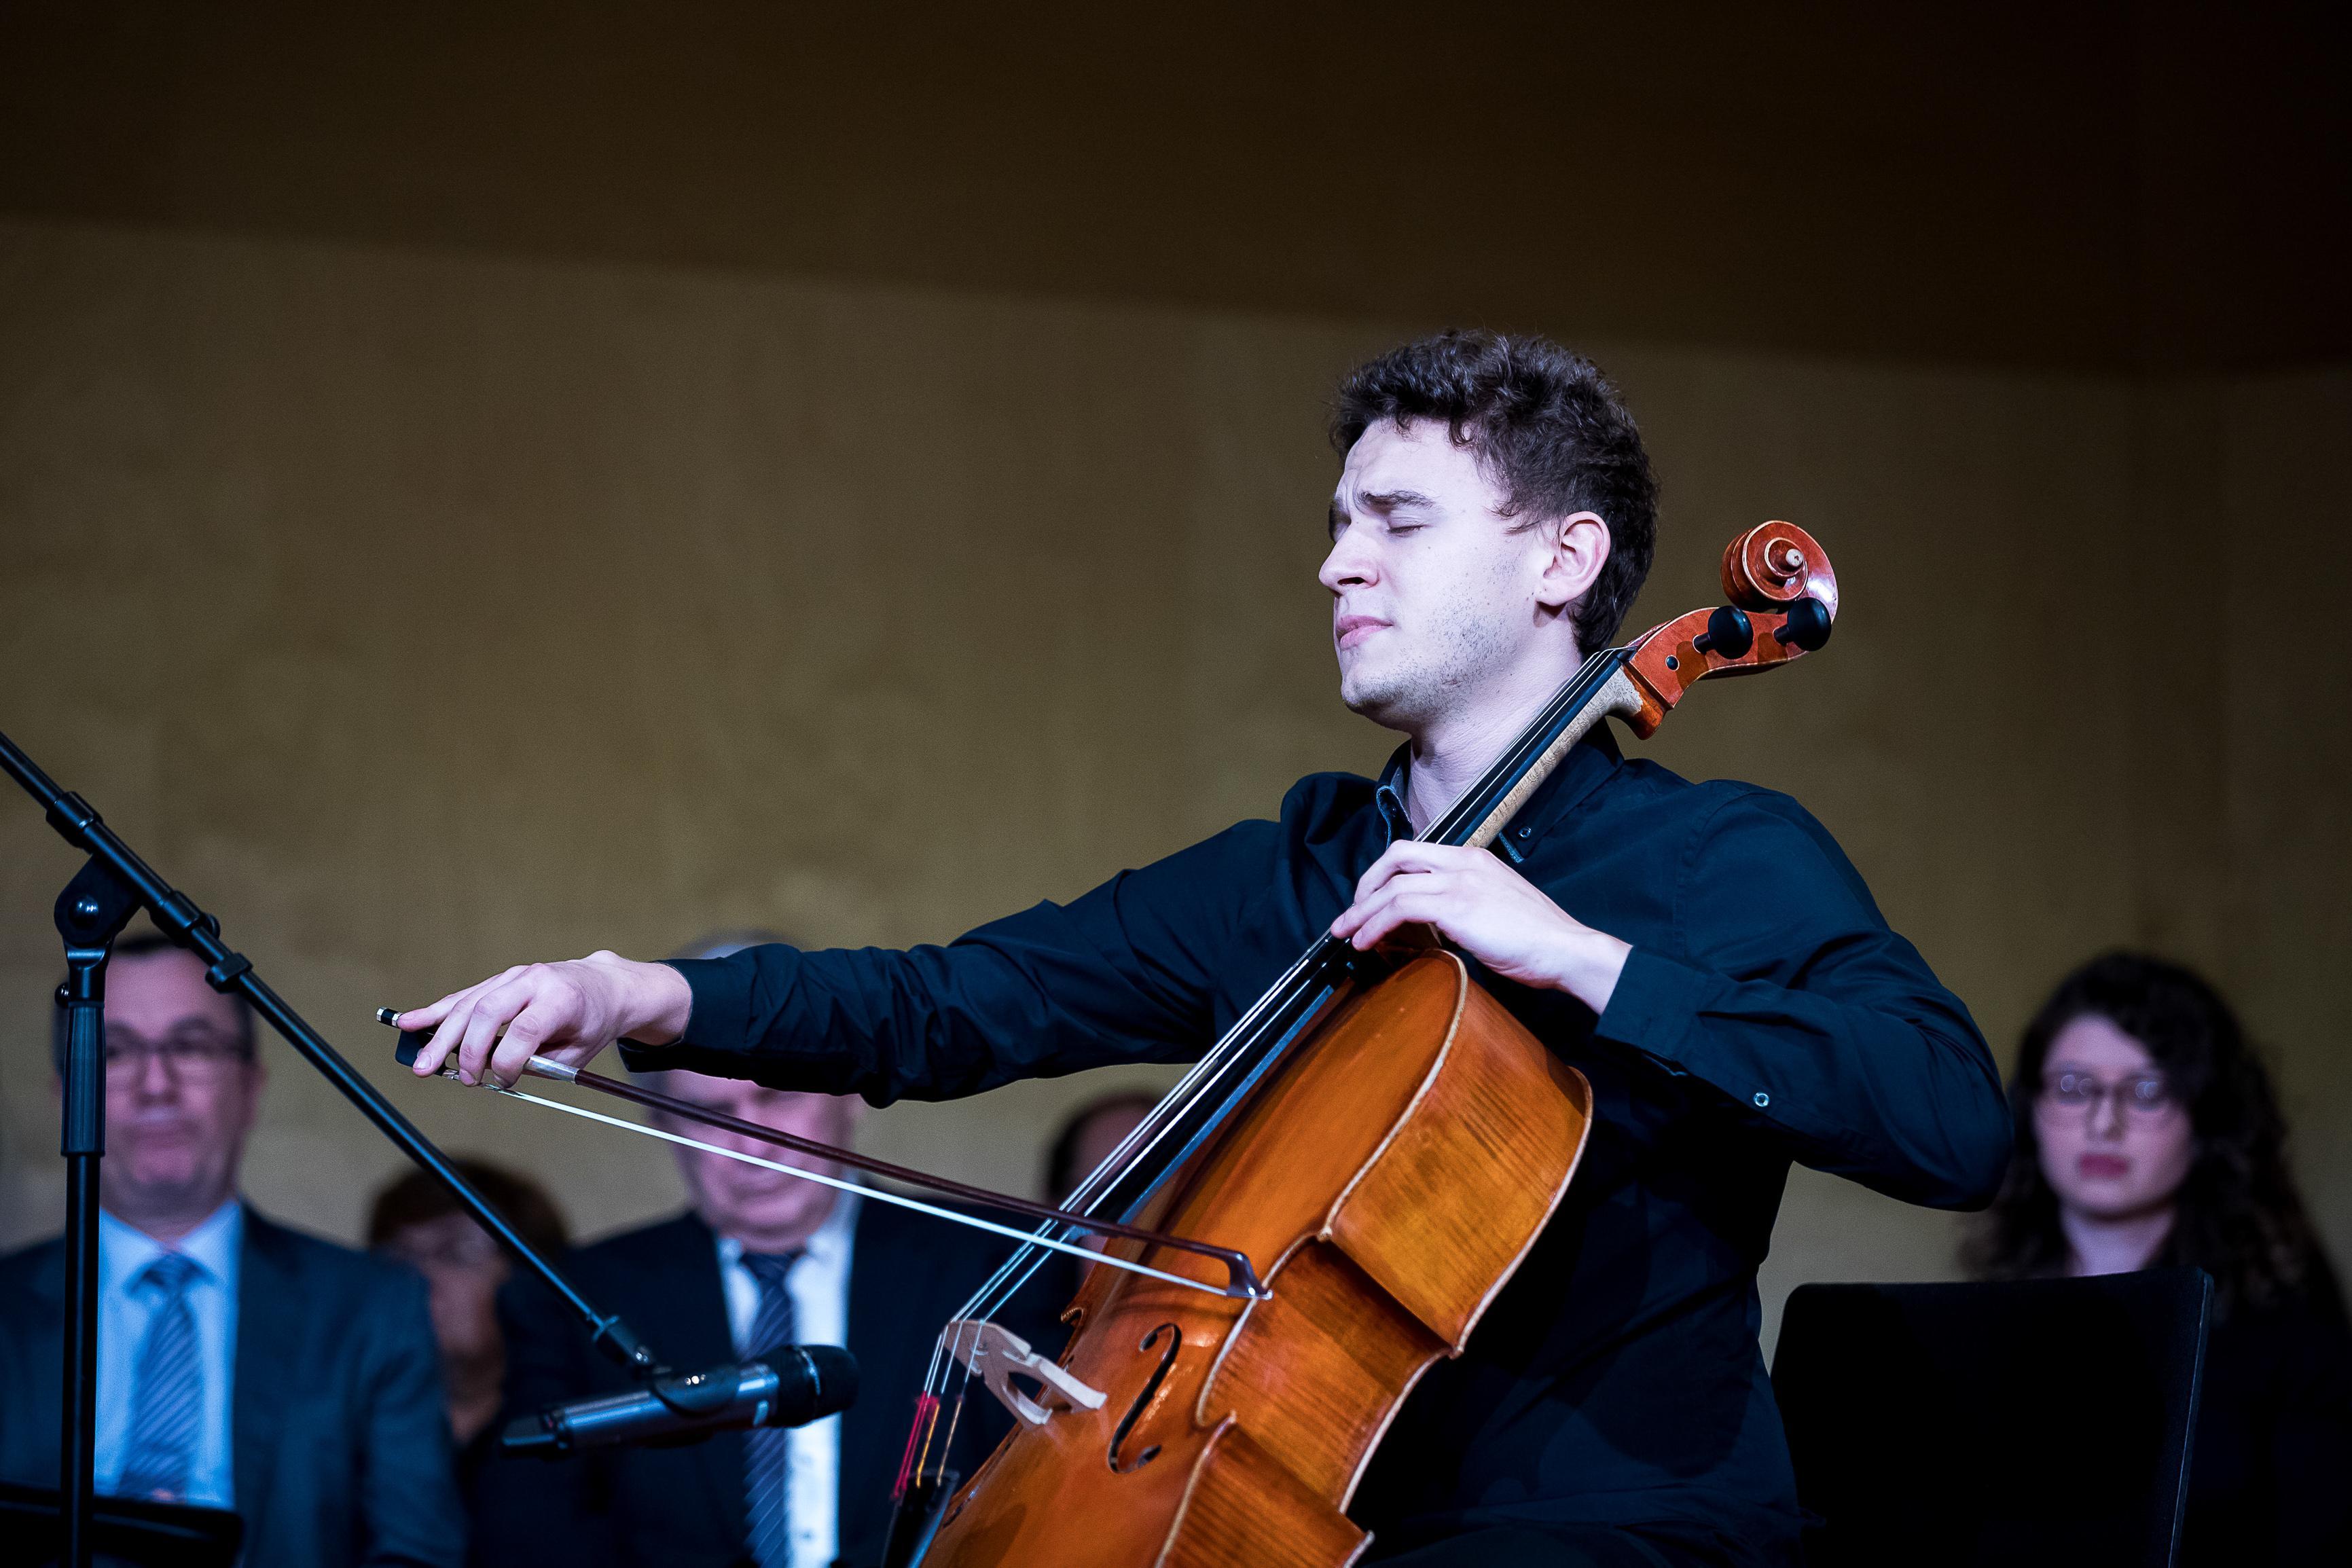 Barnabas Baranyai performed Gaspar Cassado's Requiebros. Image credit: CEU / Zoltan Adrian, Kepszerkesztoseg